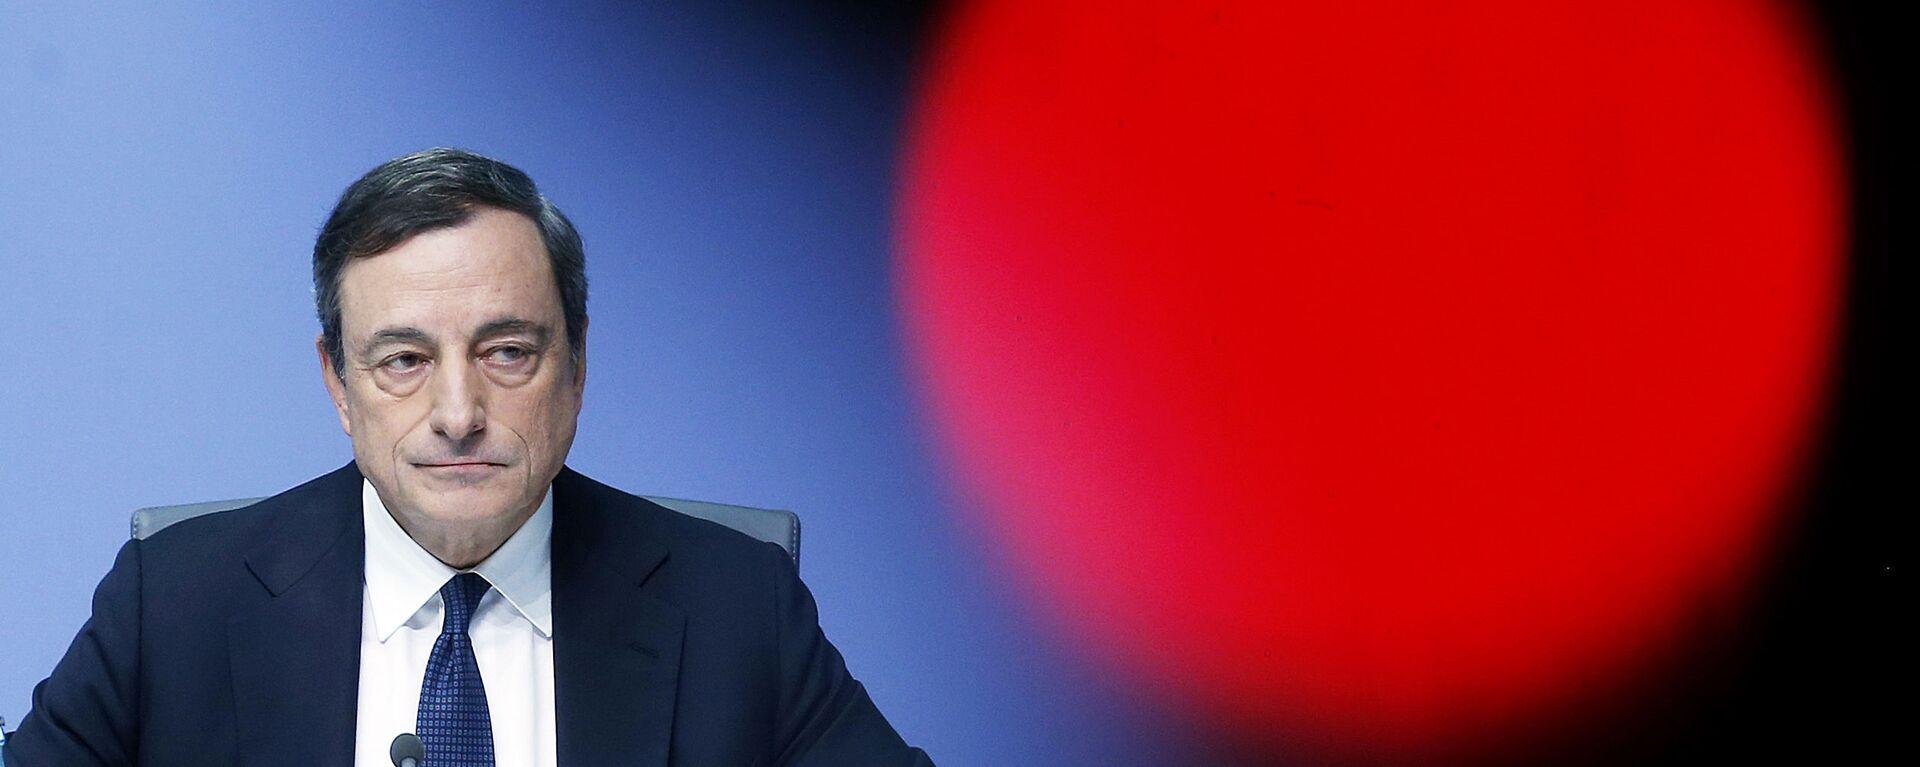 Mario Draghi - Sputnik Italia, 1920, 07.02.2021